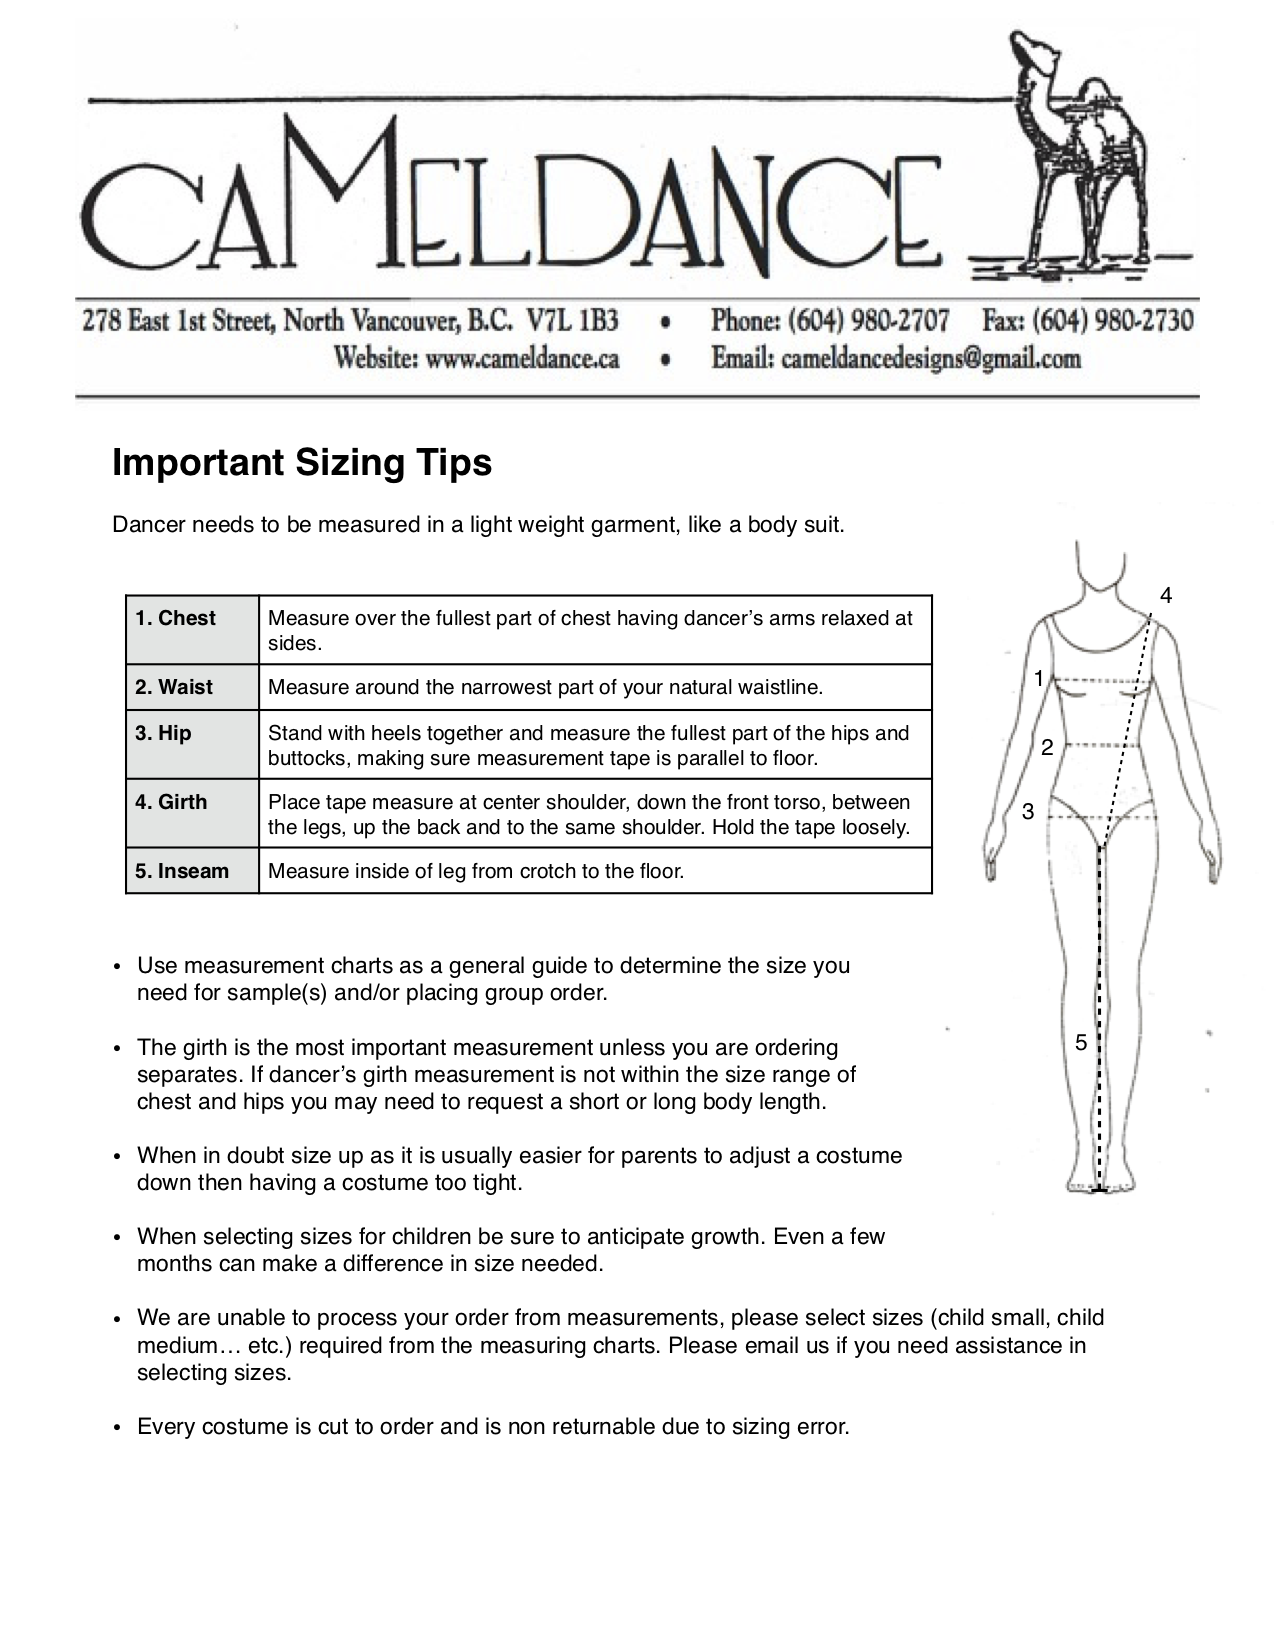 Cameldance Designs 3.png